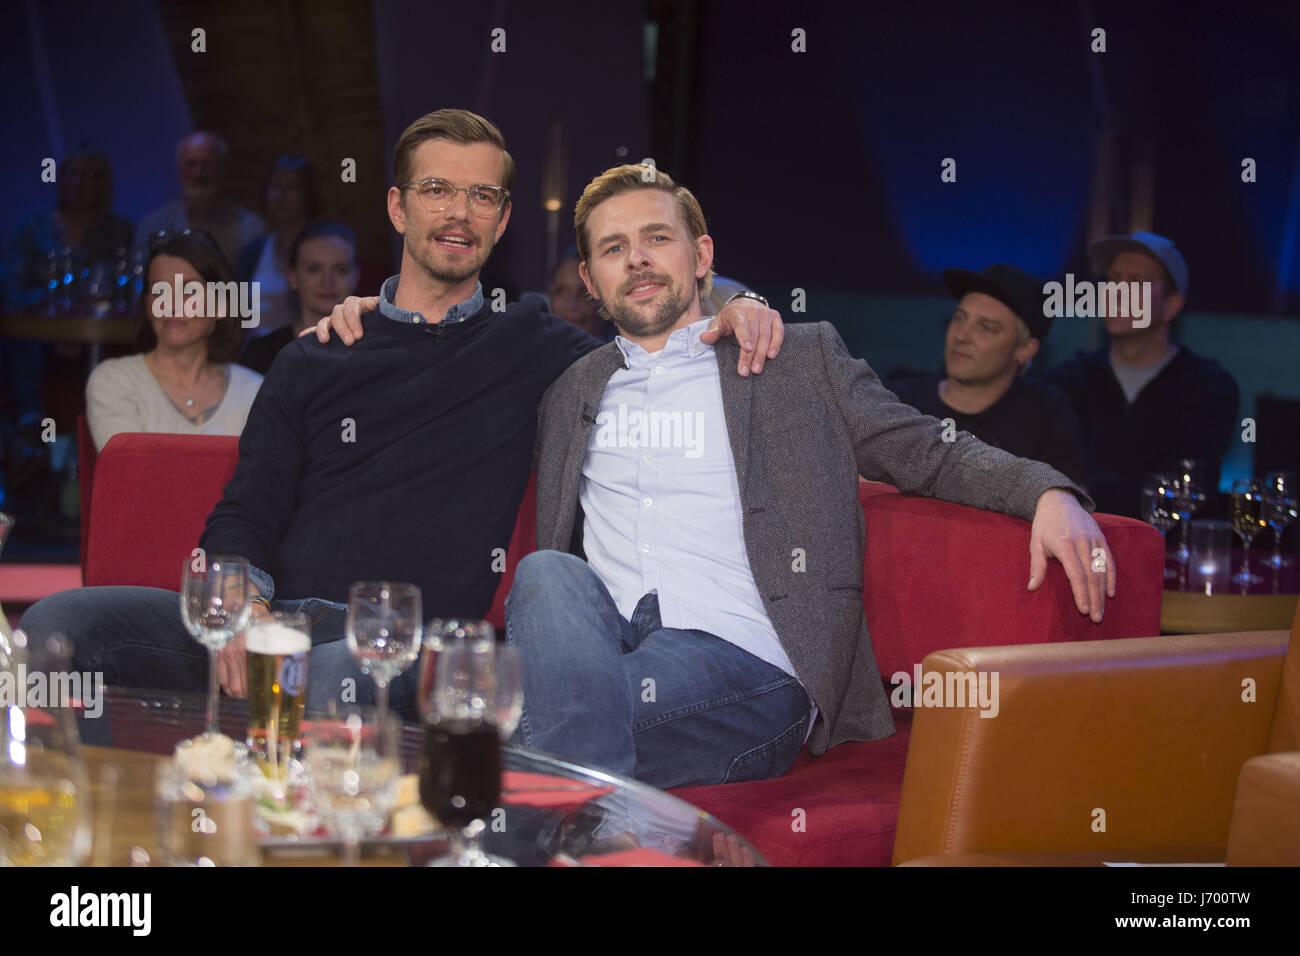 Deutsche ndr tv talkshow ndr talkshow im ndr studio mit joko winterscheidt klaas heufer umlauf for Moderatoren ndr talkshow